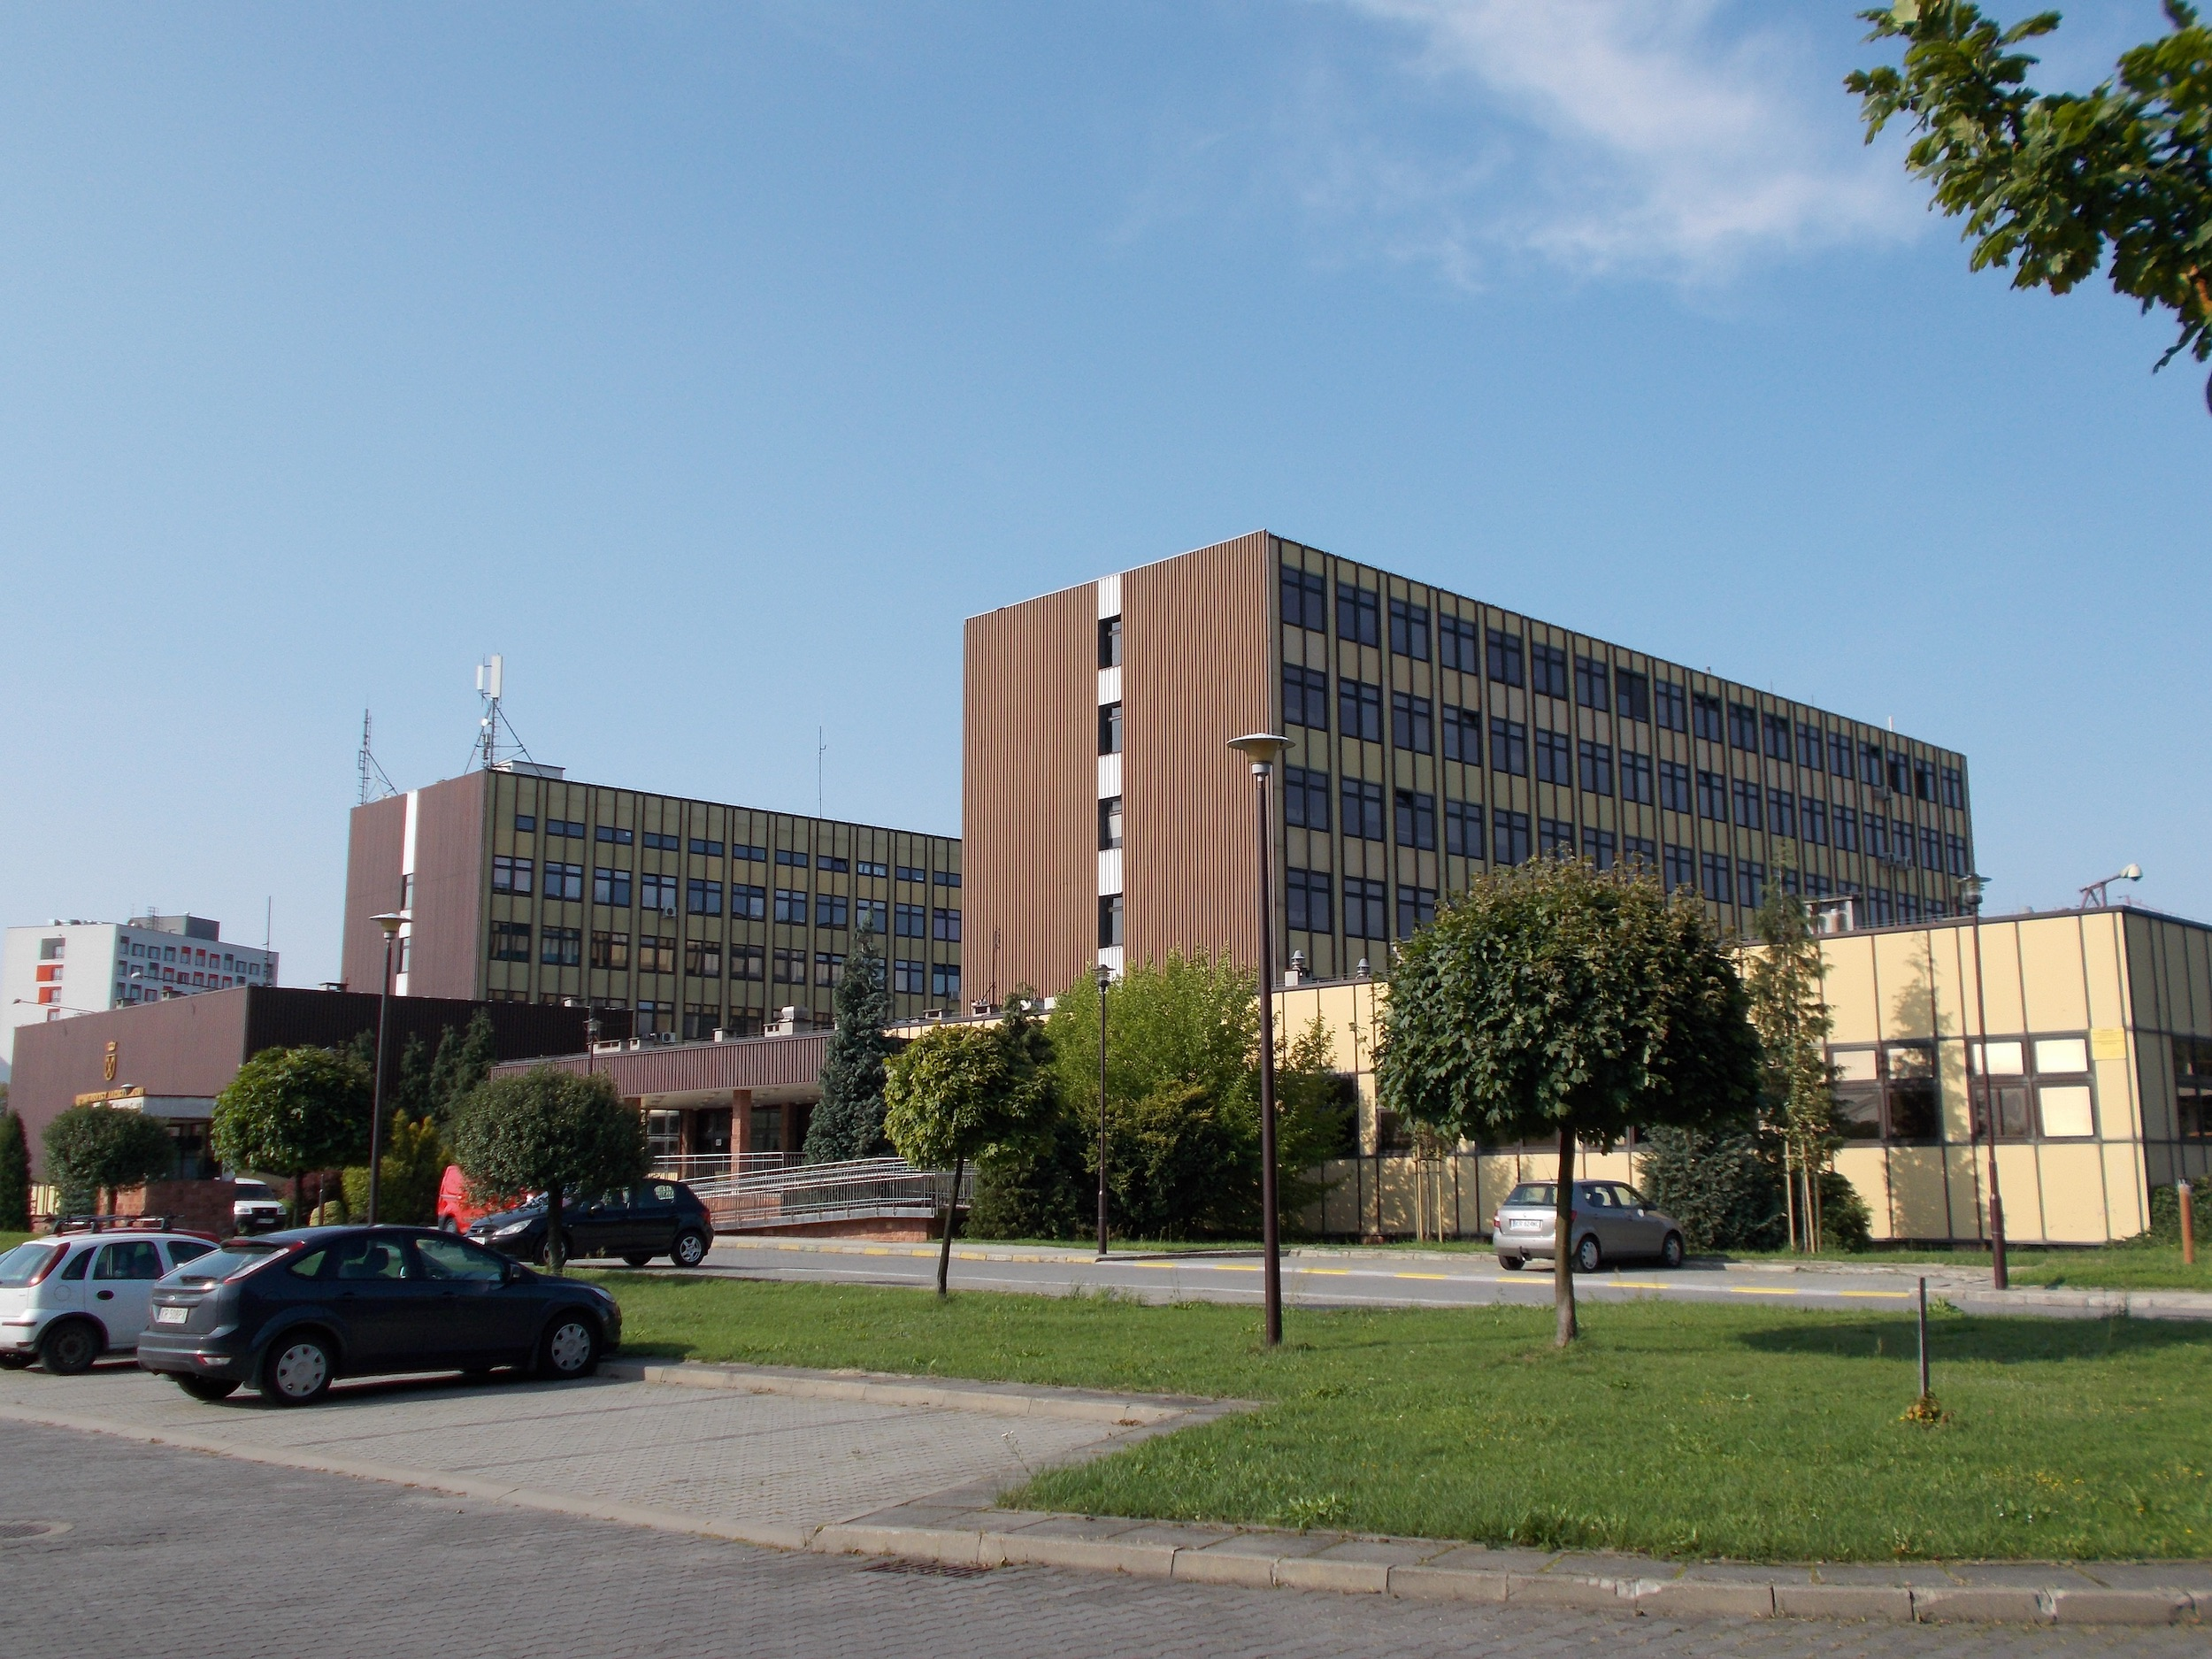 Association of University Museums